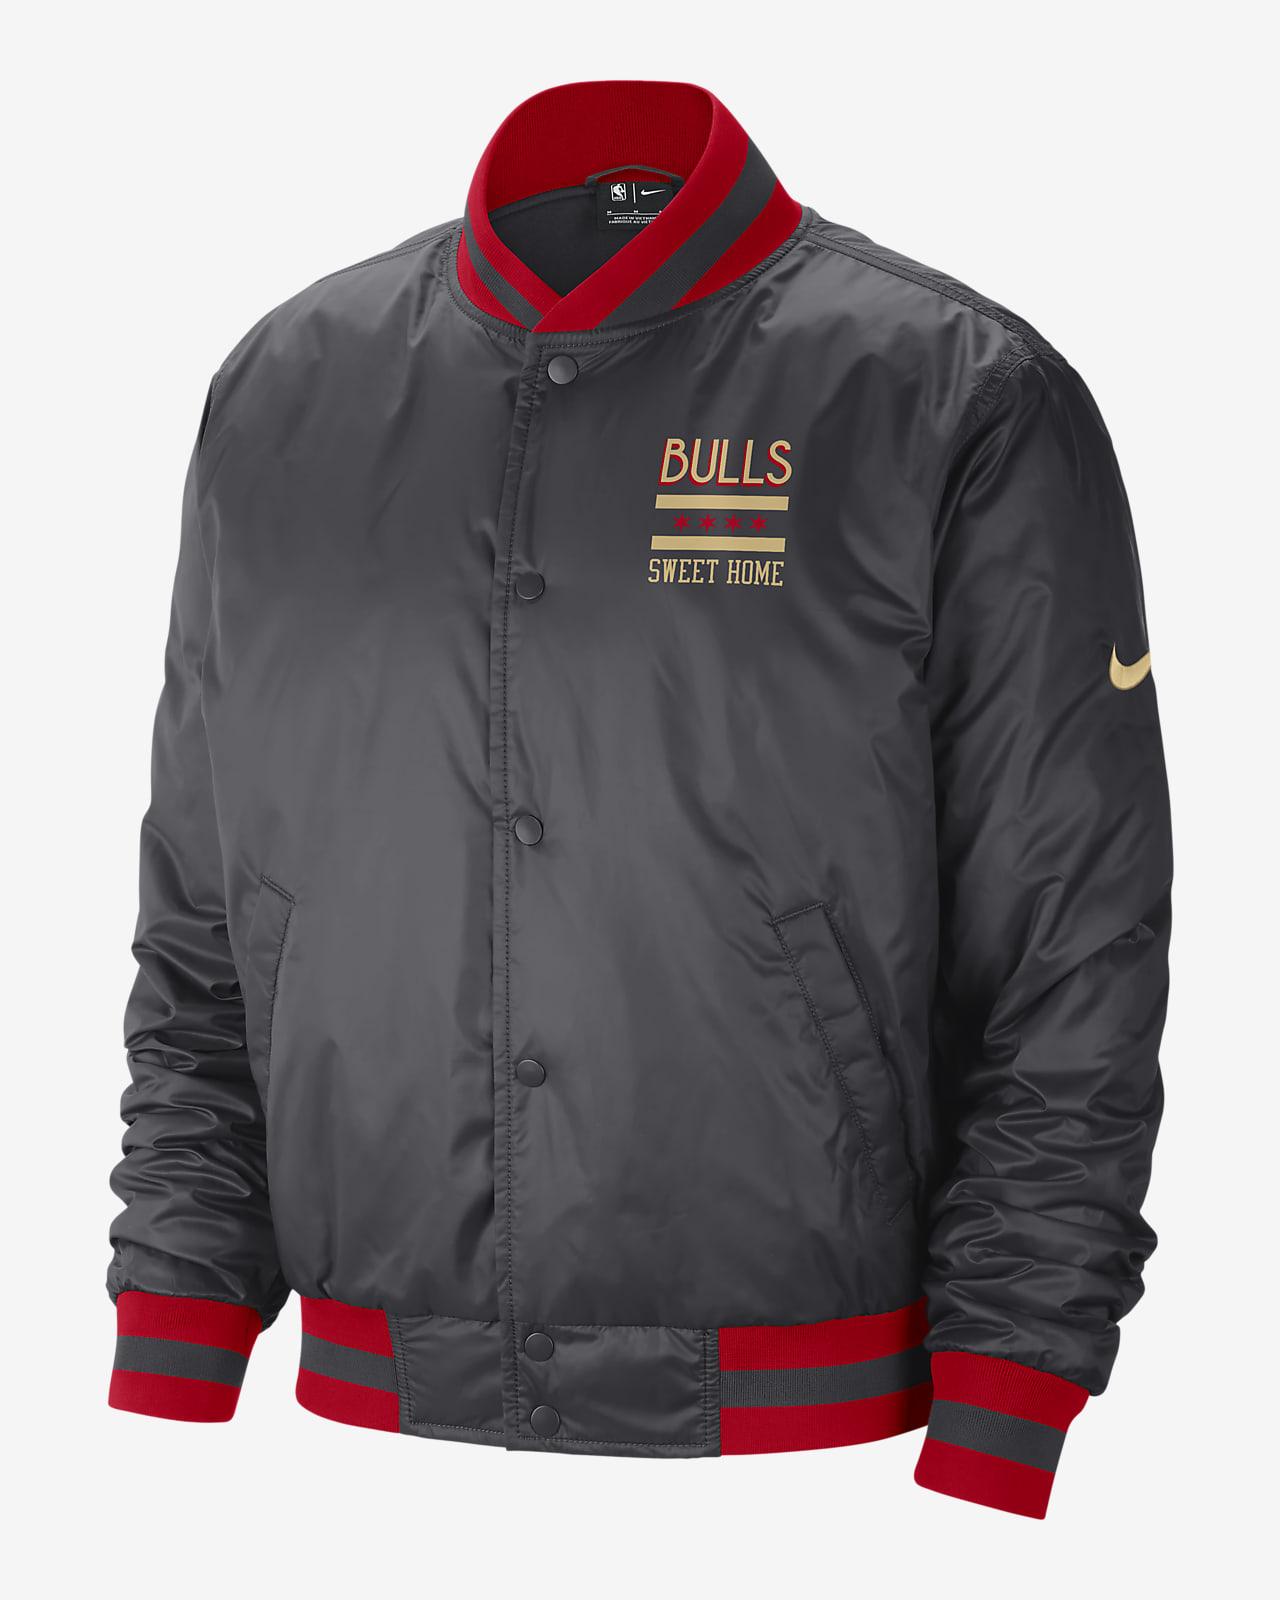 Chicago Bulls City Edition Courtside Men's Nike NBA Jacket